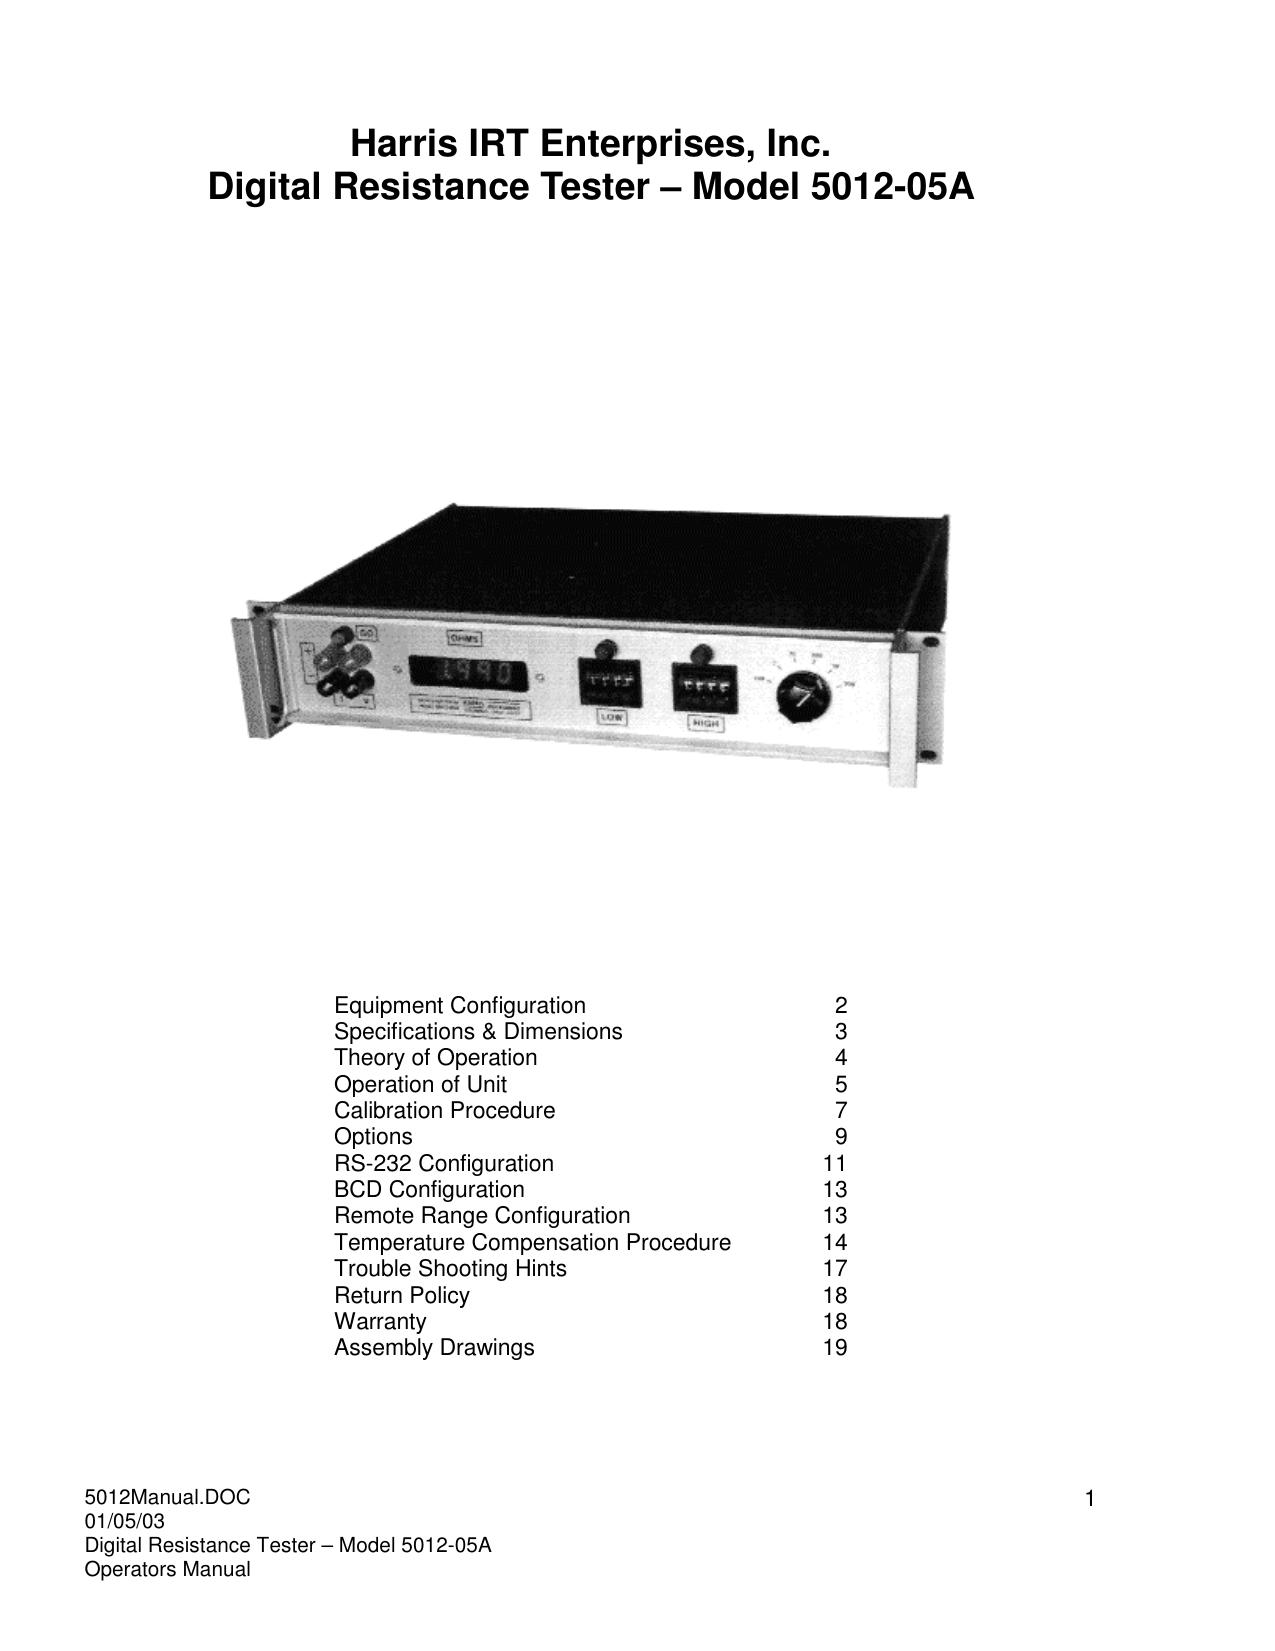 Model 5012-05A - Harris Industrial Resistance Testers | manualzz com